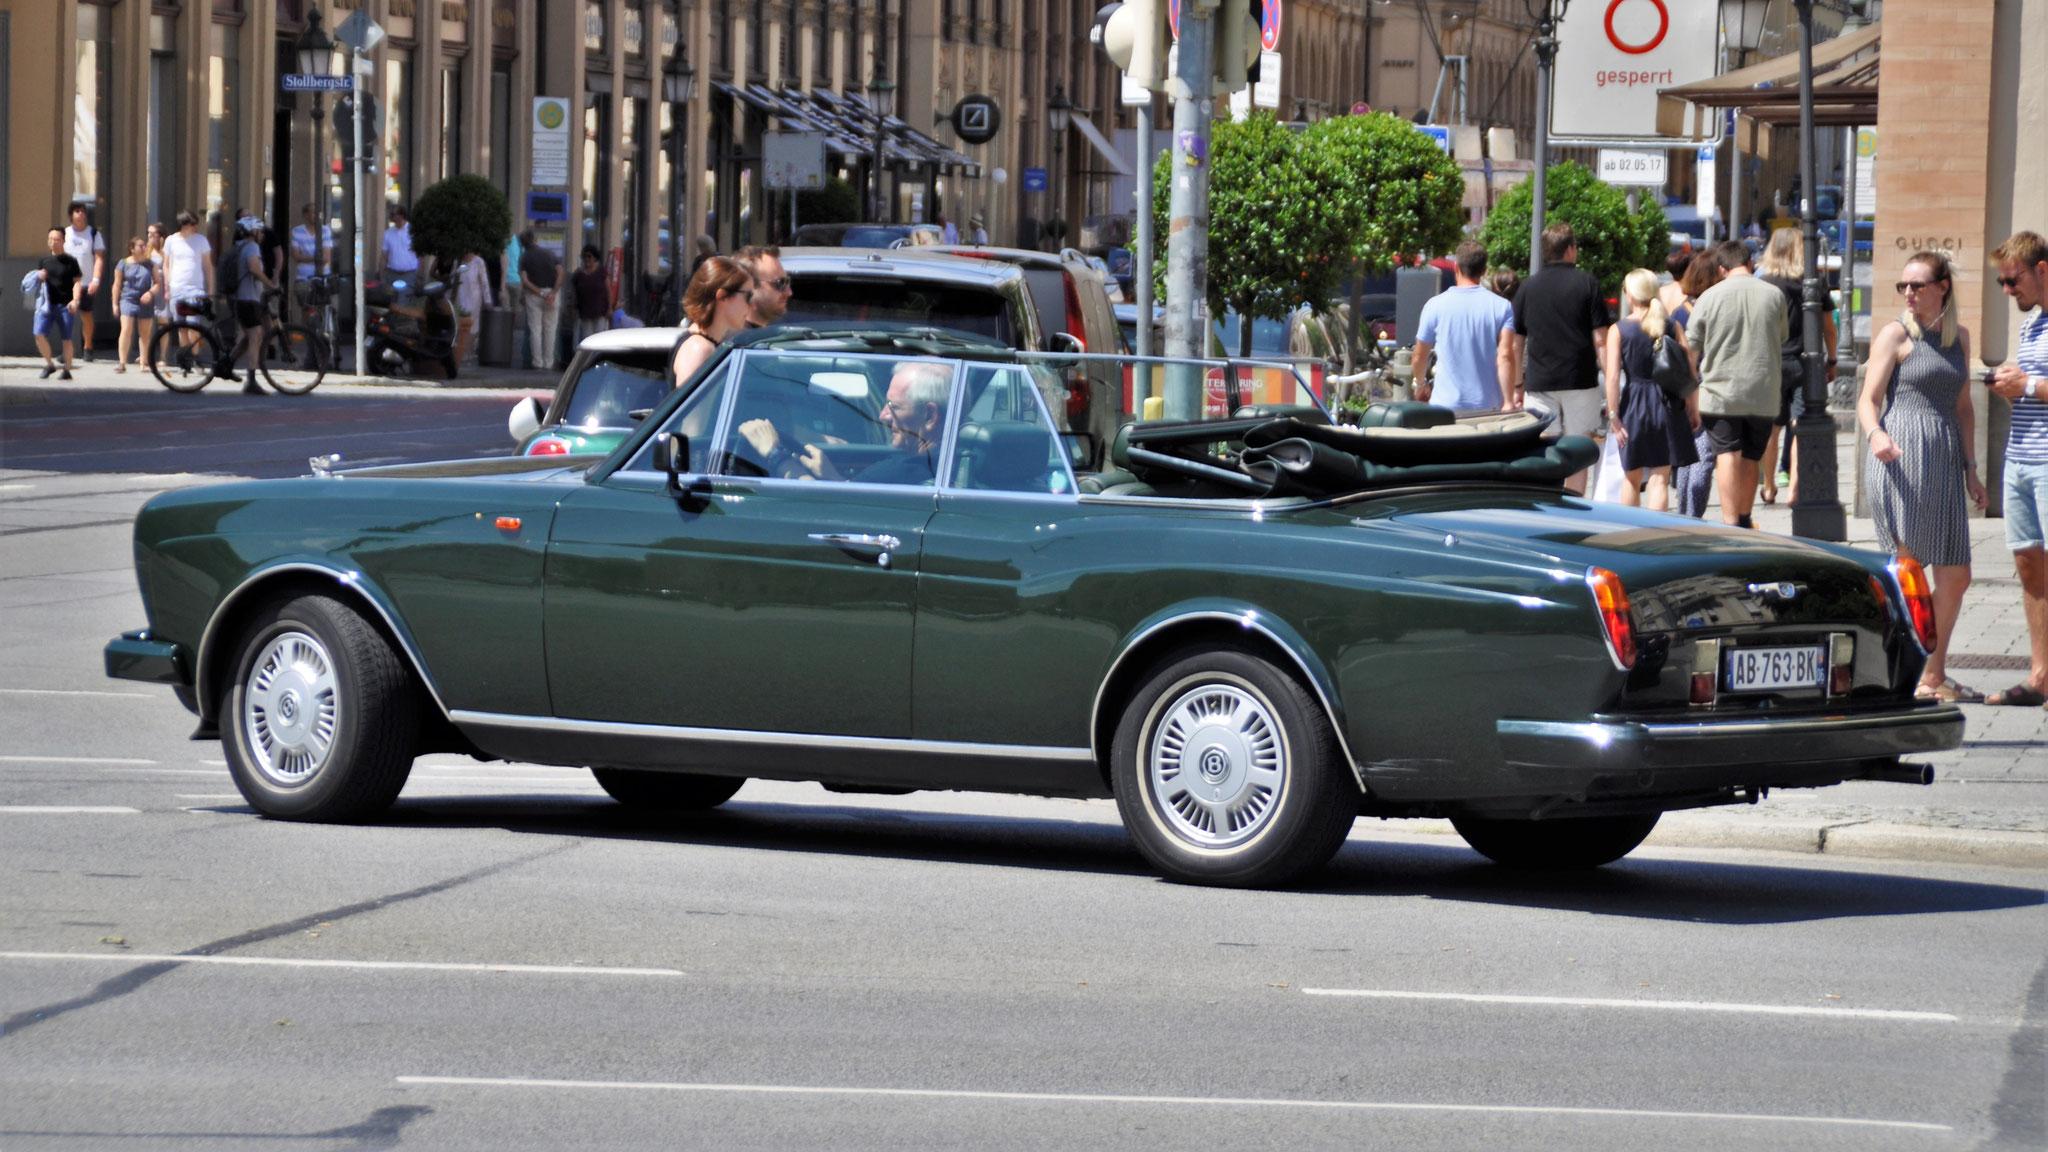 Bentley Corniche - AB-763-BK (FRA)